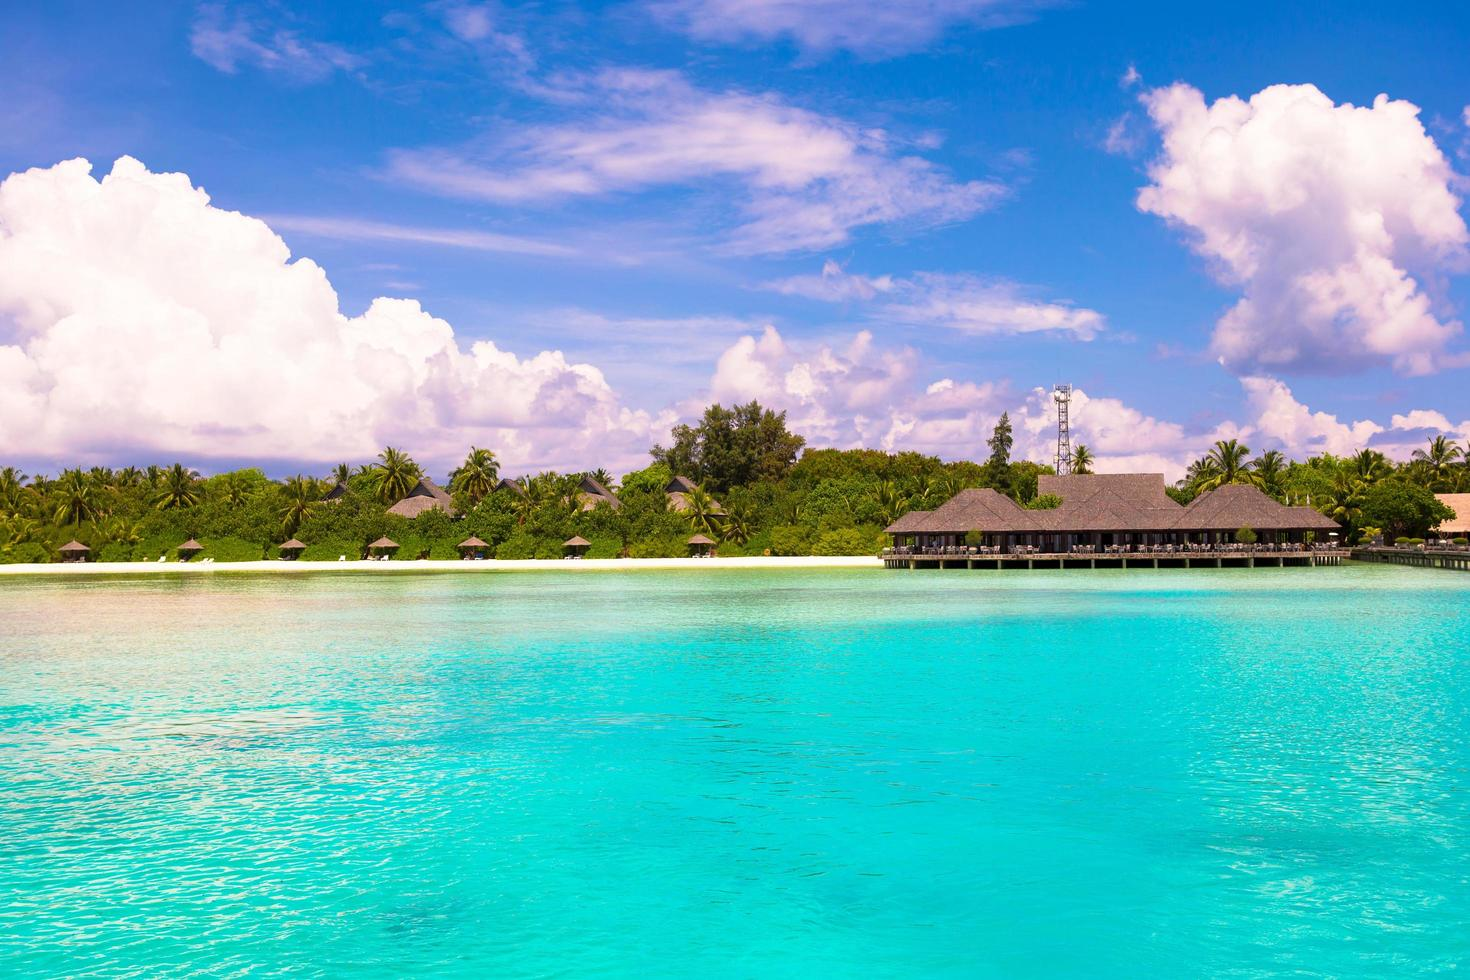 Malediven, Südasien, 2020 - tagsüber am Strand foto